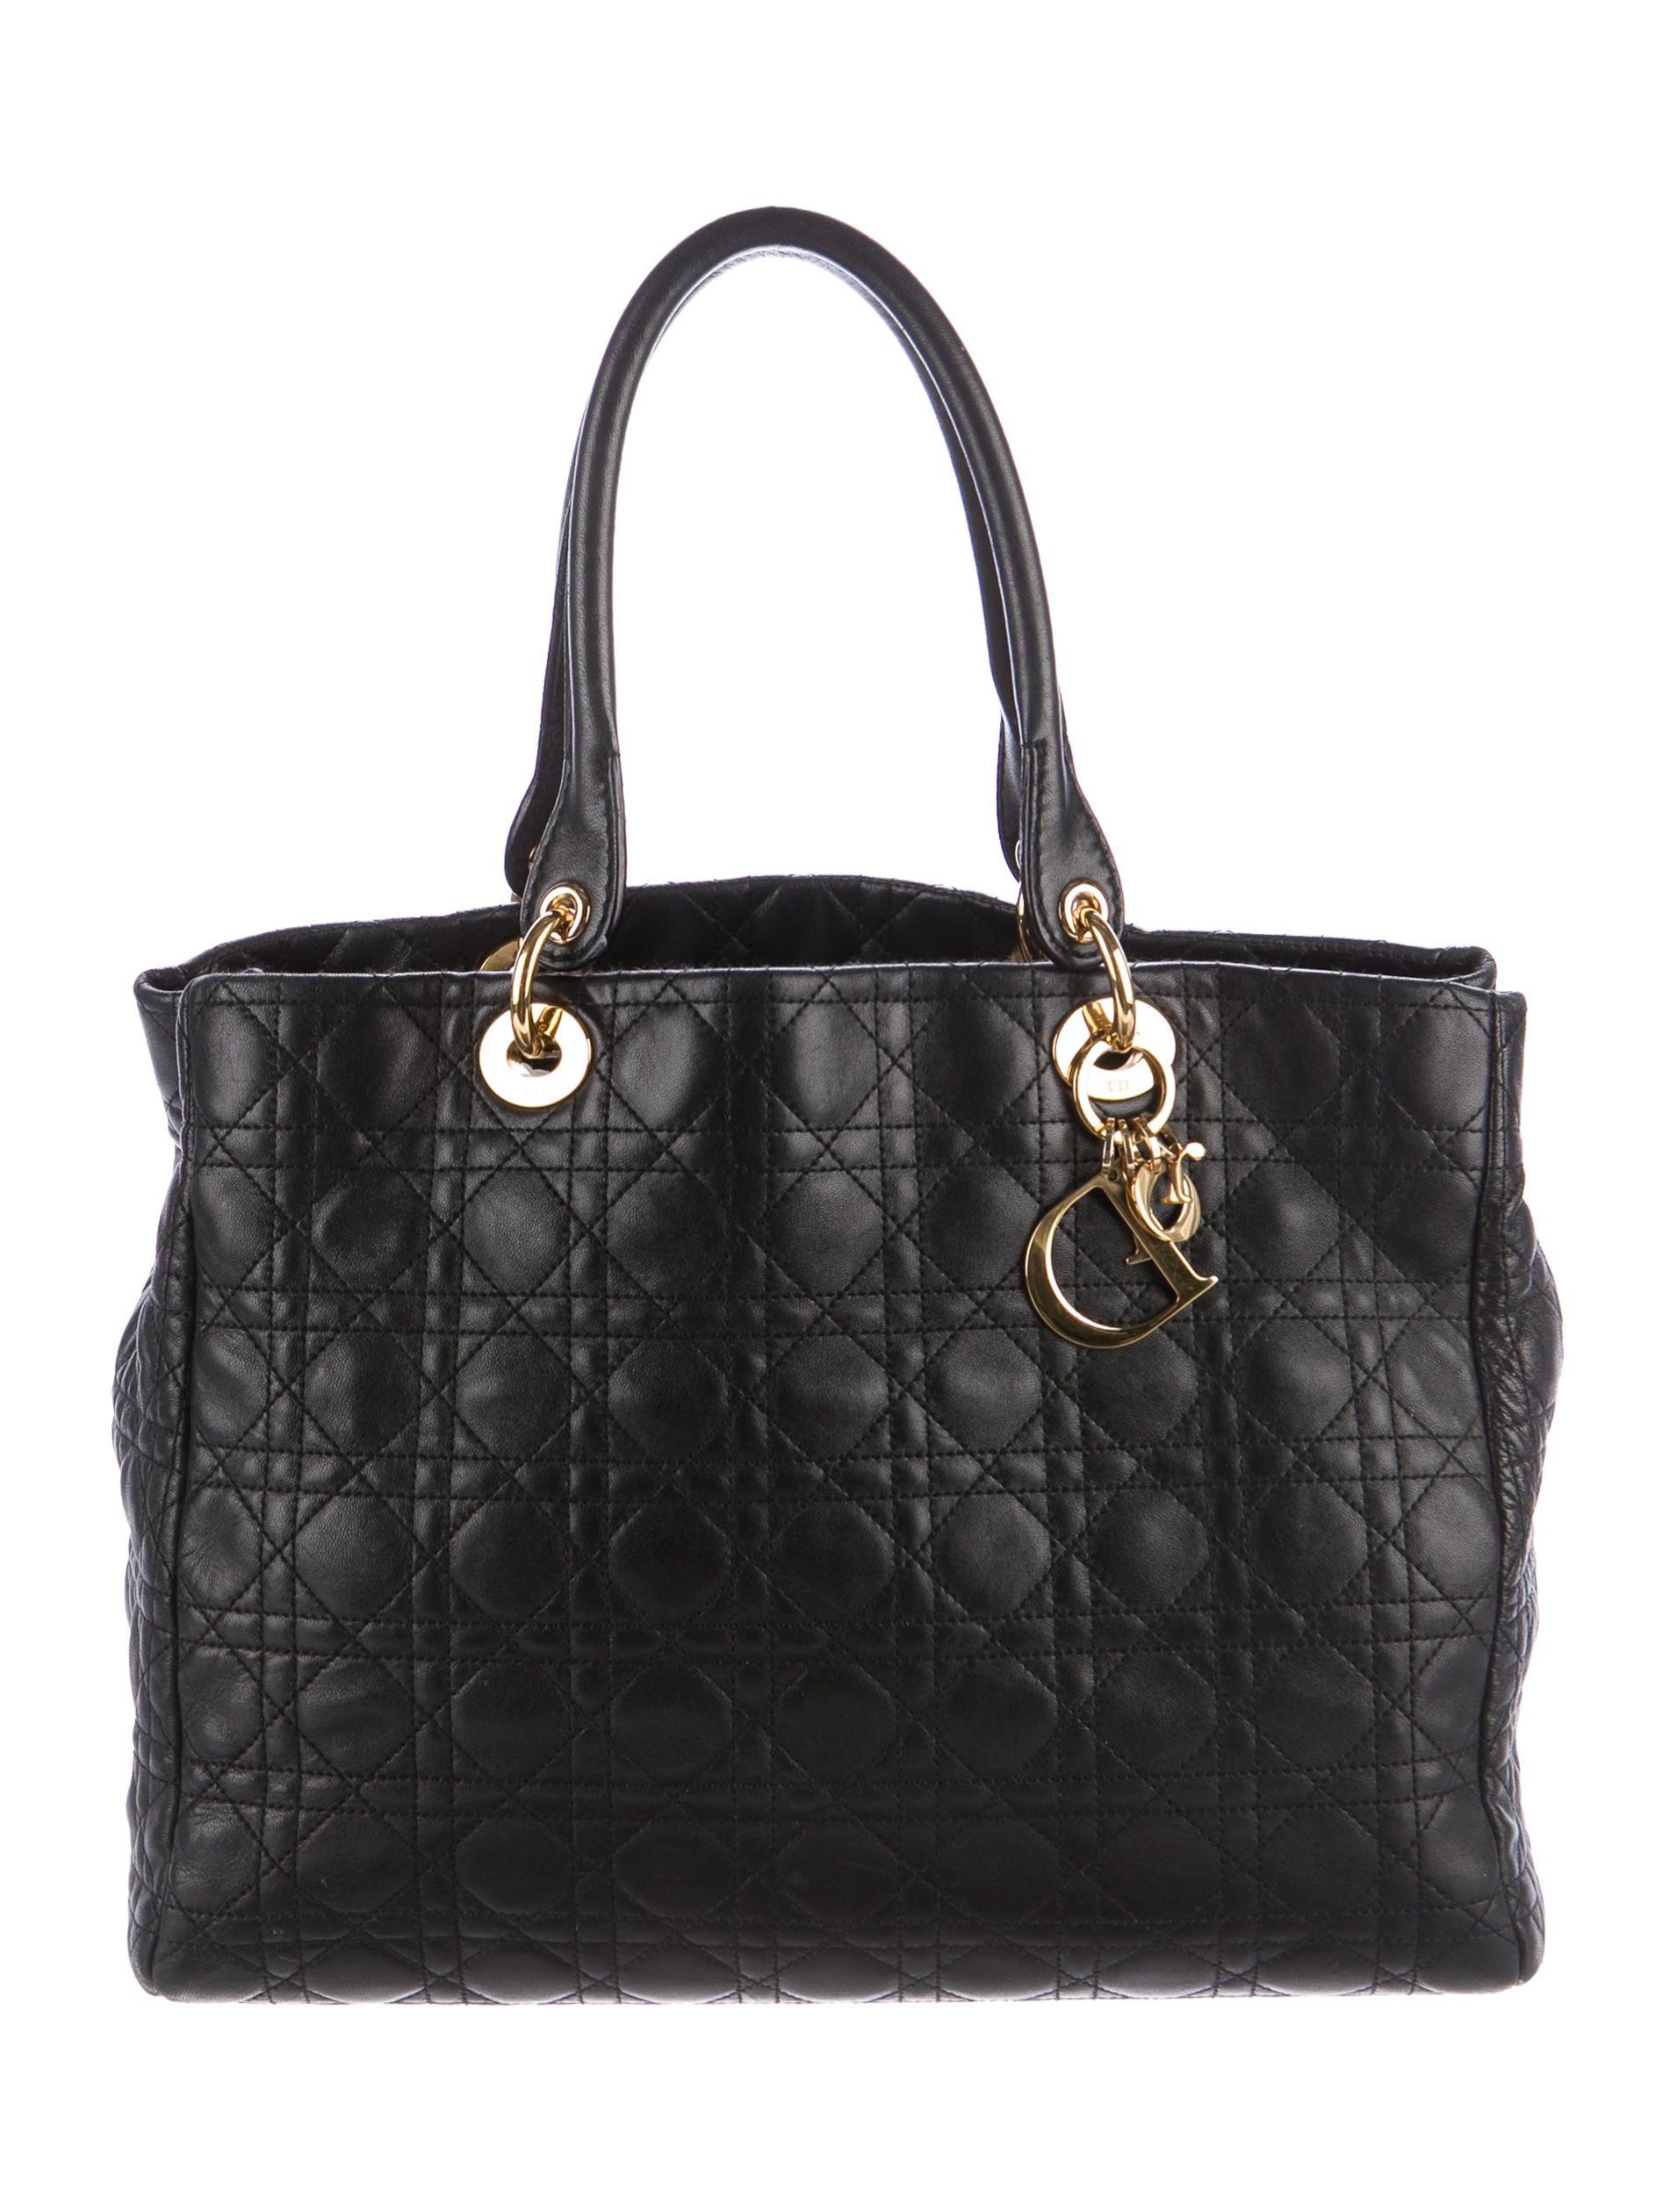 Christian Dior Soft Lady Dior Tote - Handbags - CHR59225 ...